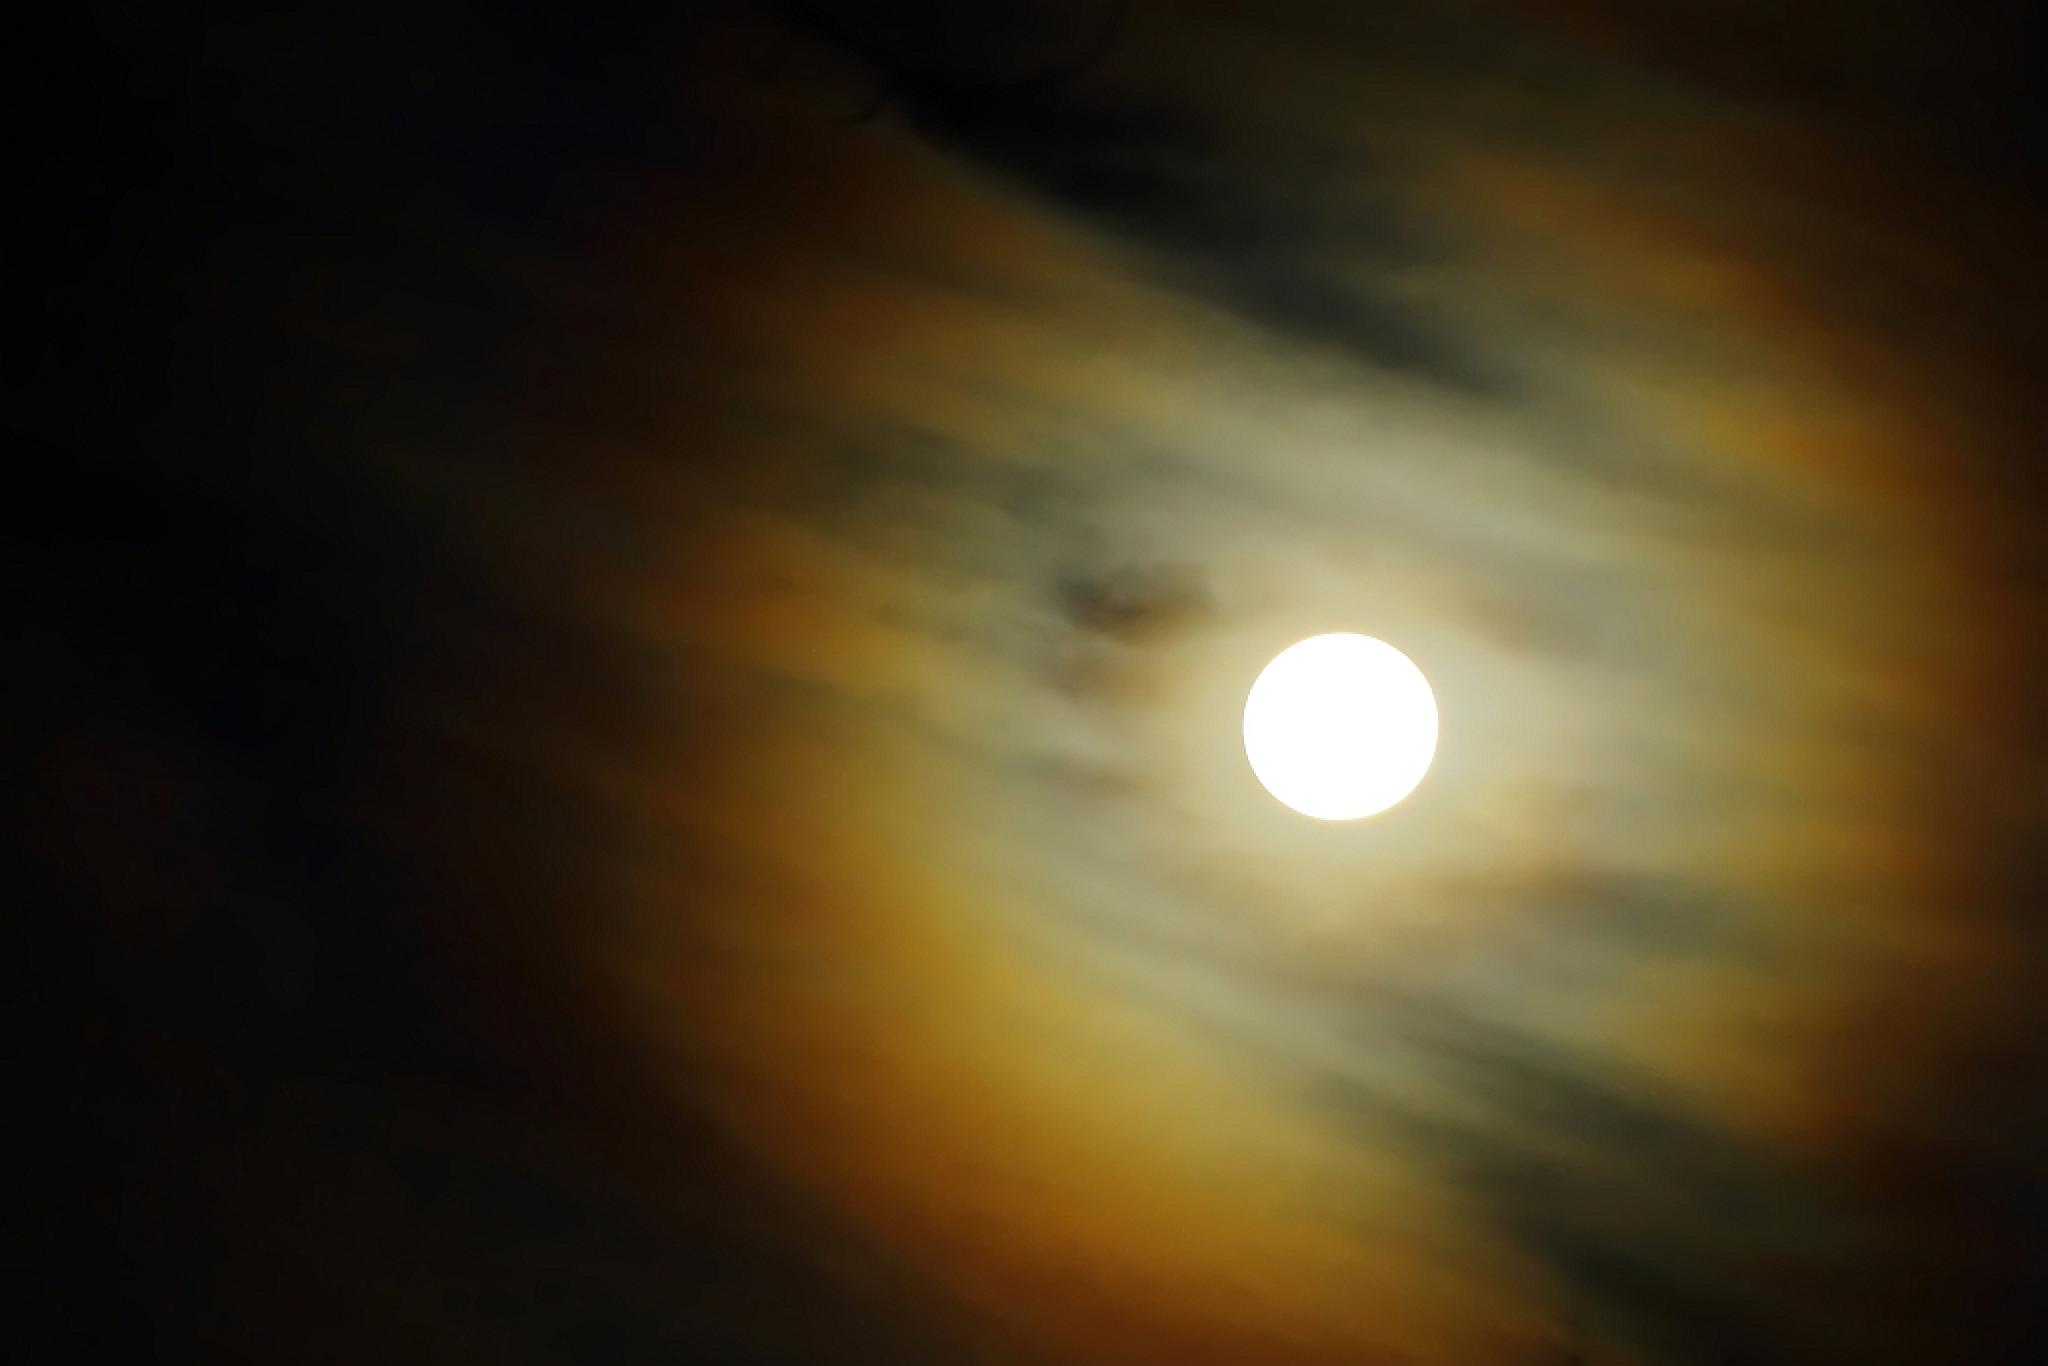 Moon by Marcin Chmielecki